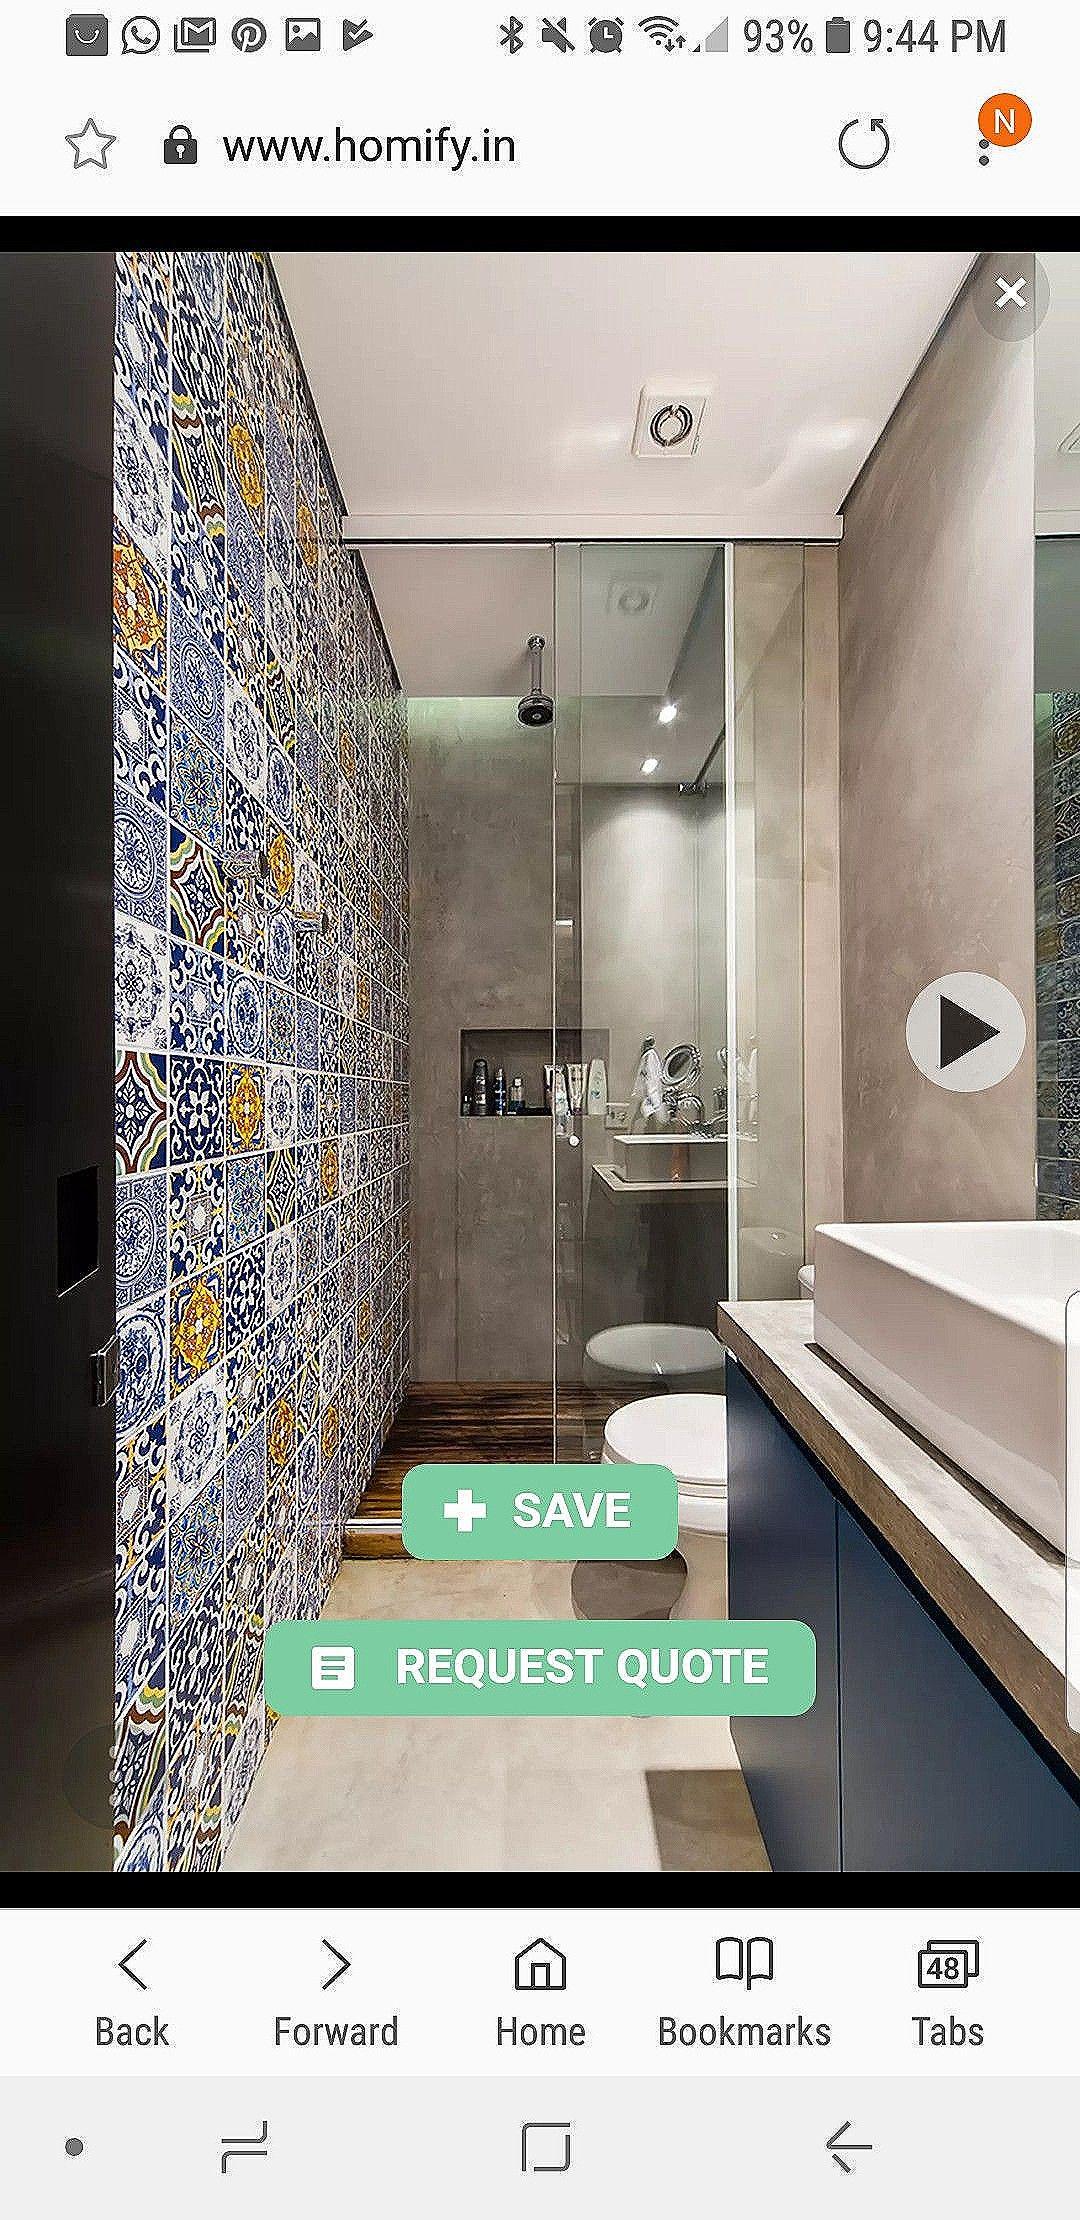 Beautiful Bathroom Design For A Small Space With Images Bathroom Design Luxury Bathroom Design Small Simple Bathroom Designs